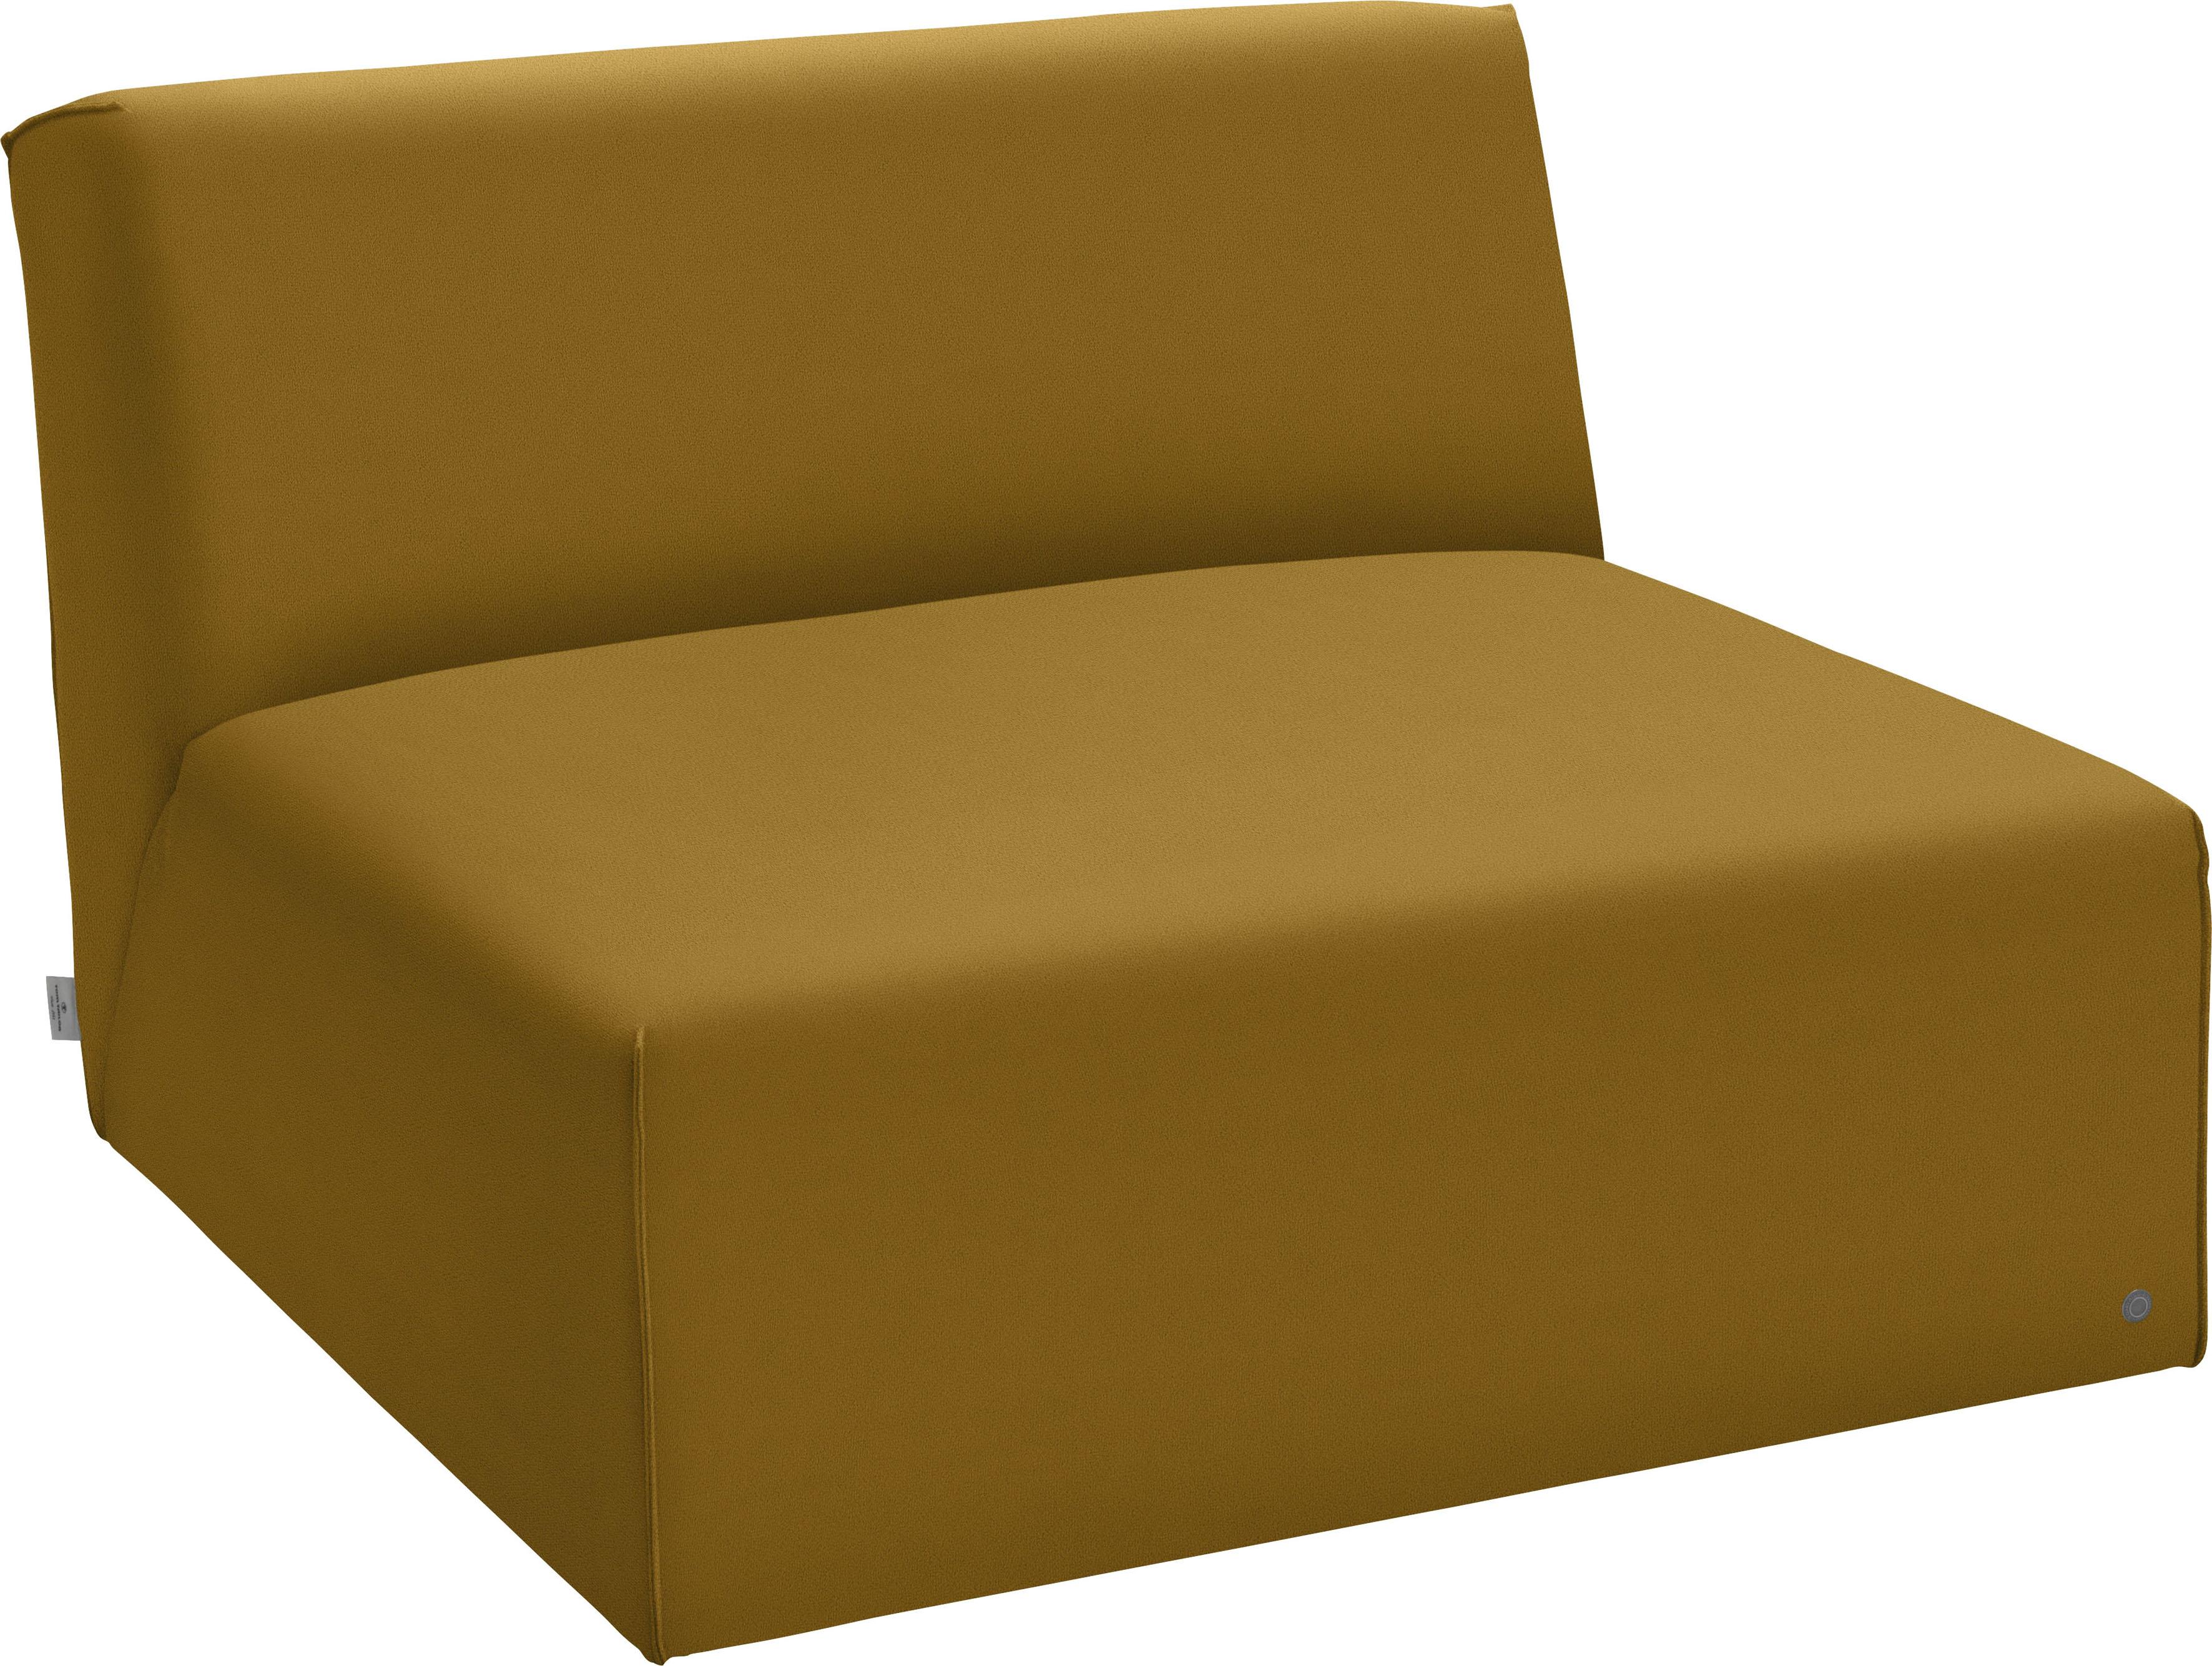 TOM TAILOR Sofaelement ELEMENTS, Sitzelement ohne Armlehne gelb Sofaelemente Sofas Couches